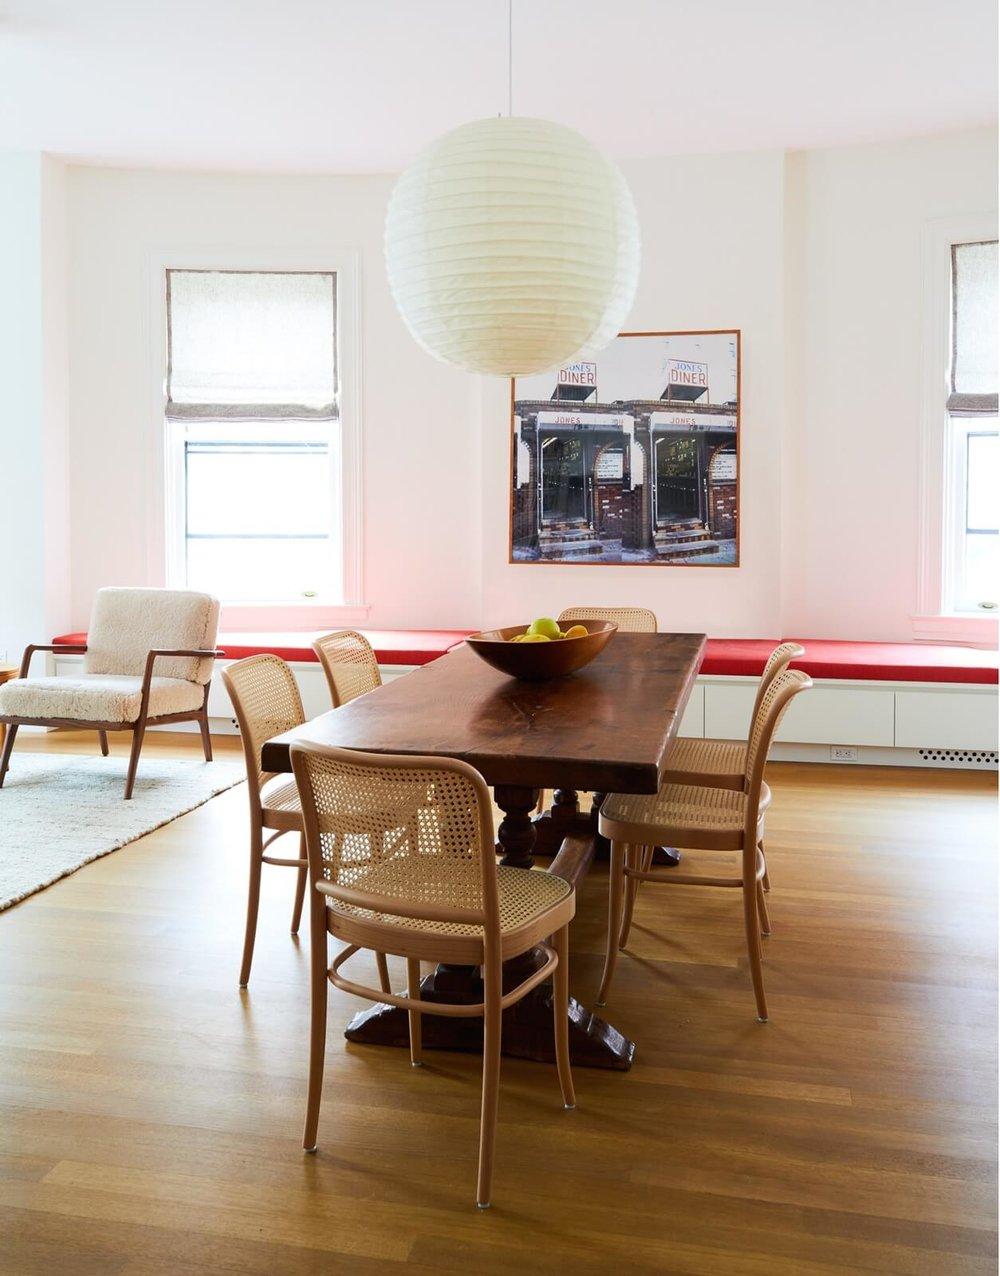 interior-design-ideas-brooklyn-jesse-parris-lamb-park-slope-02.jpg